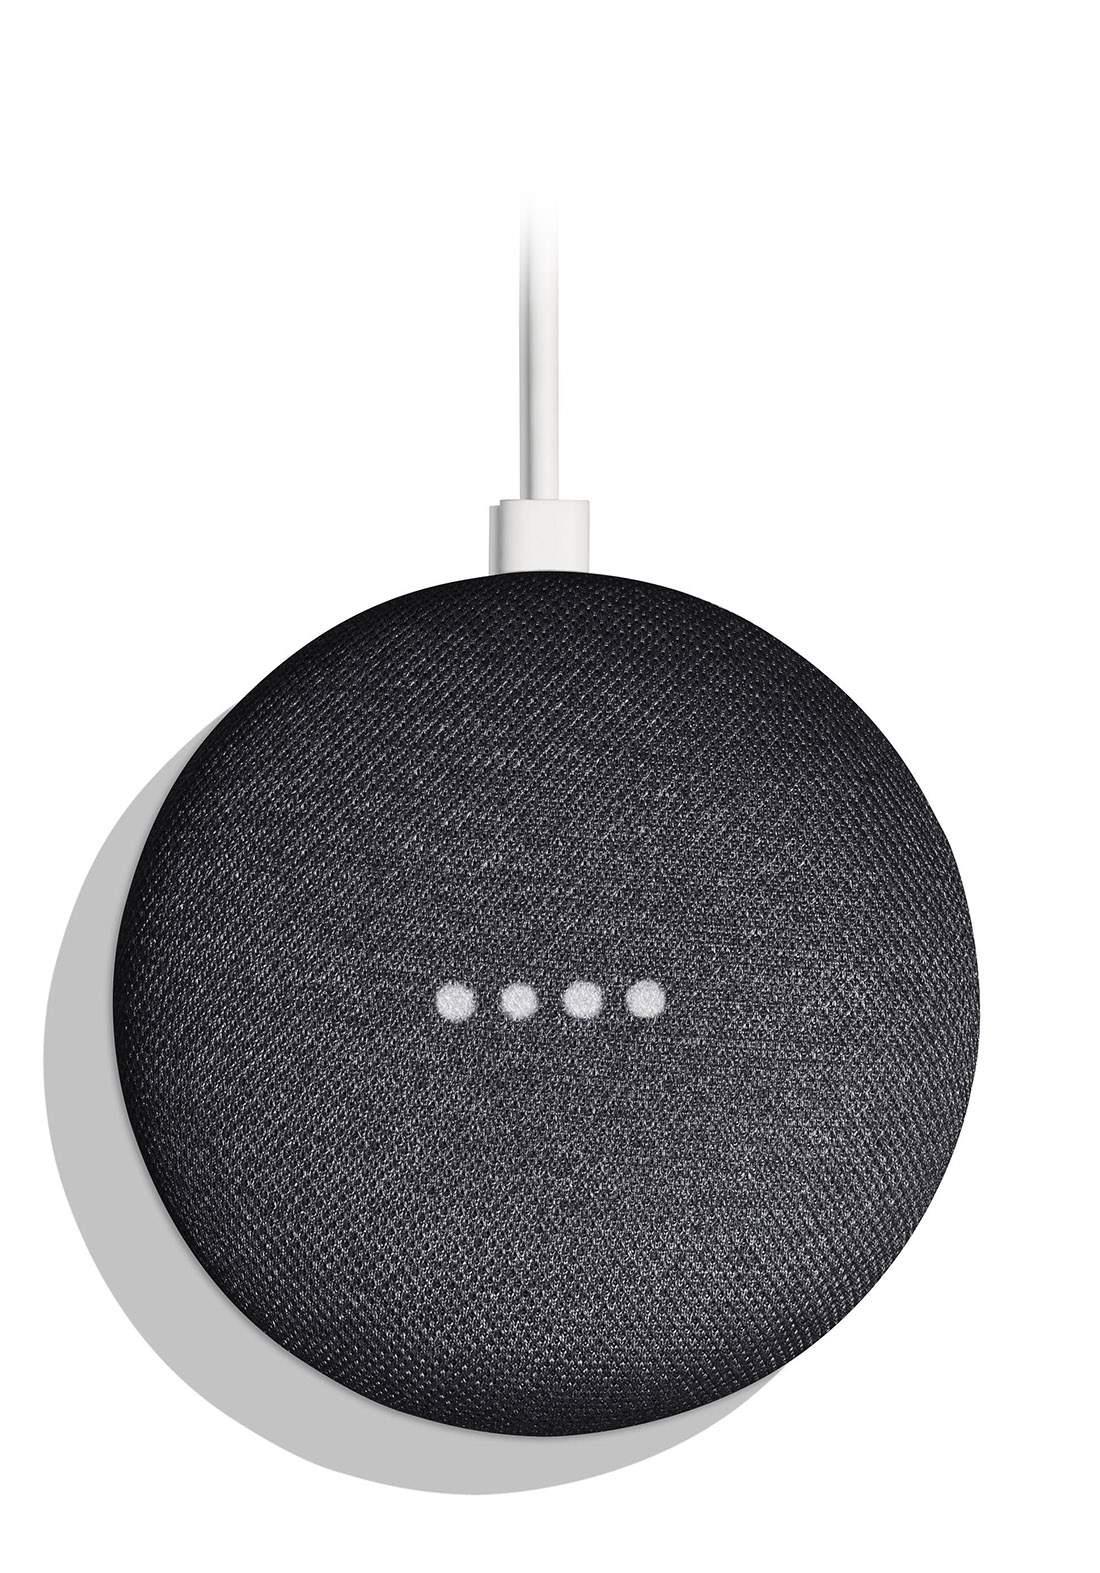 Google Home mini 3rd Generation Black مساعد صوتي ذكي